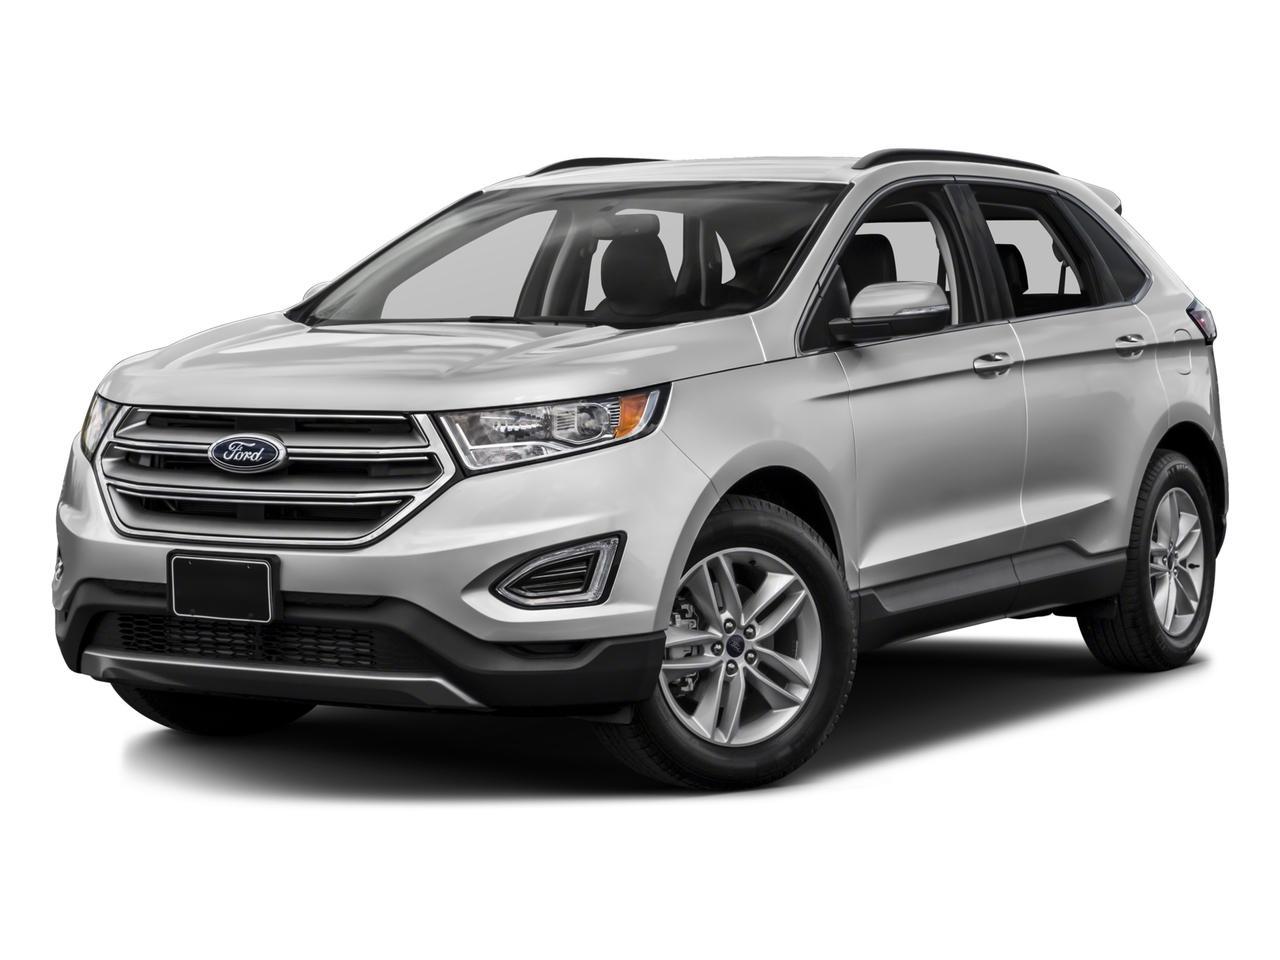 2016 Ford Edge Vehicle Photo in SELMA, TX 78154-1459